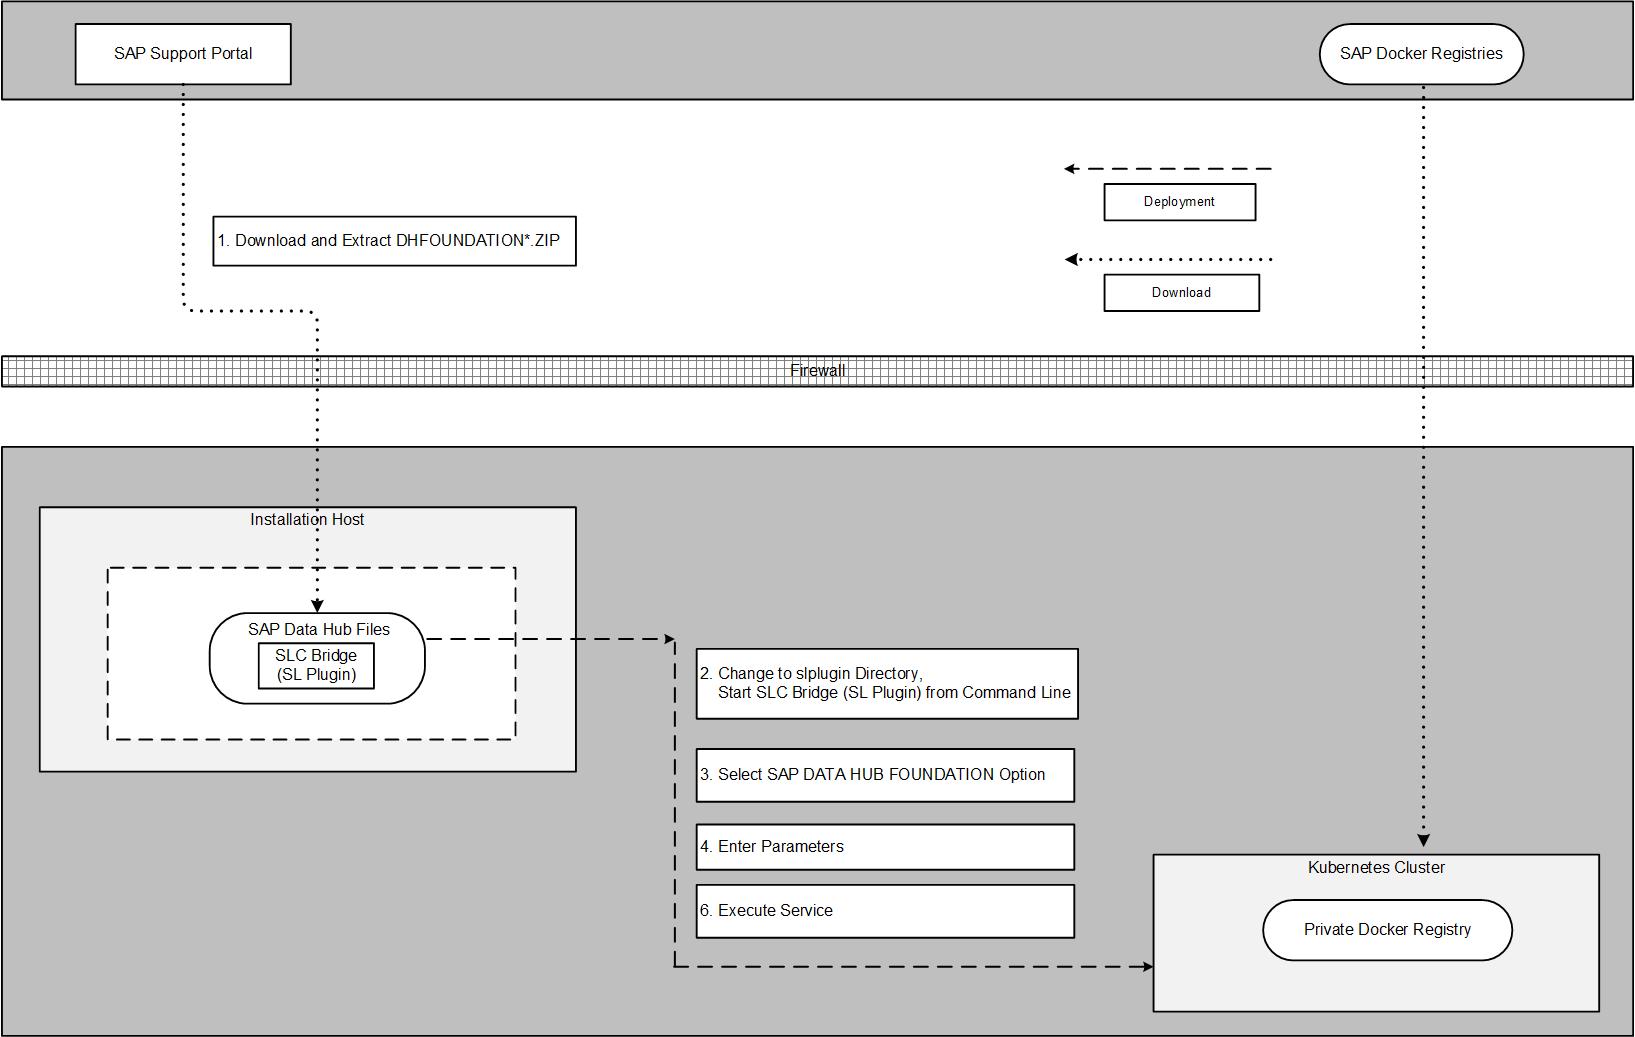 Uninstall using the SLC Bridge (SL Plugin) - SAP Help Portal